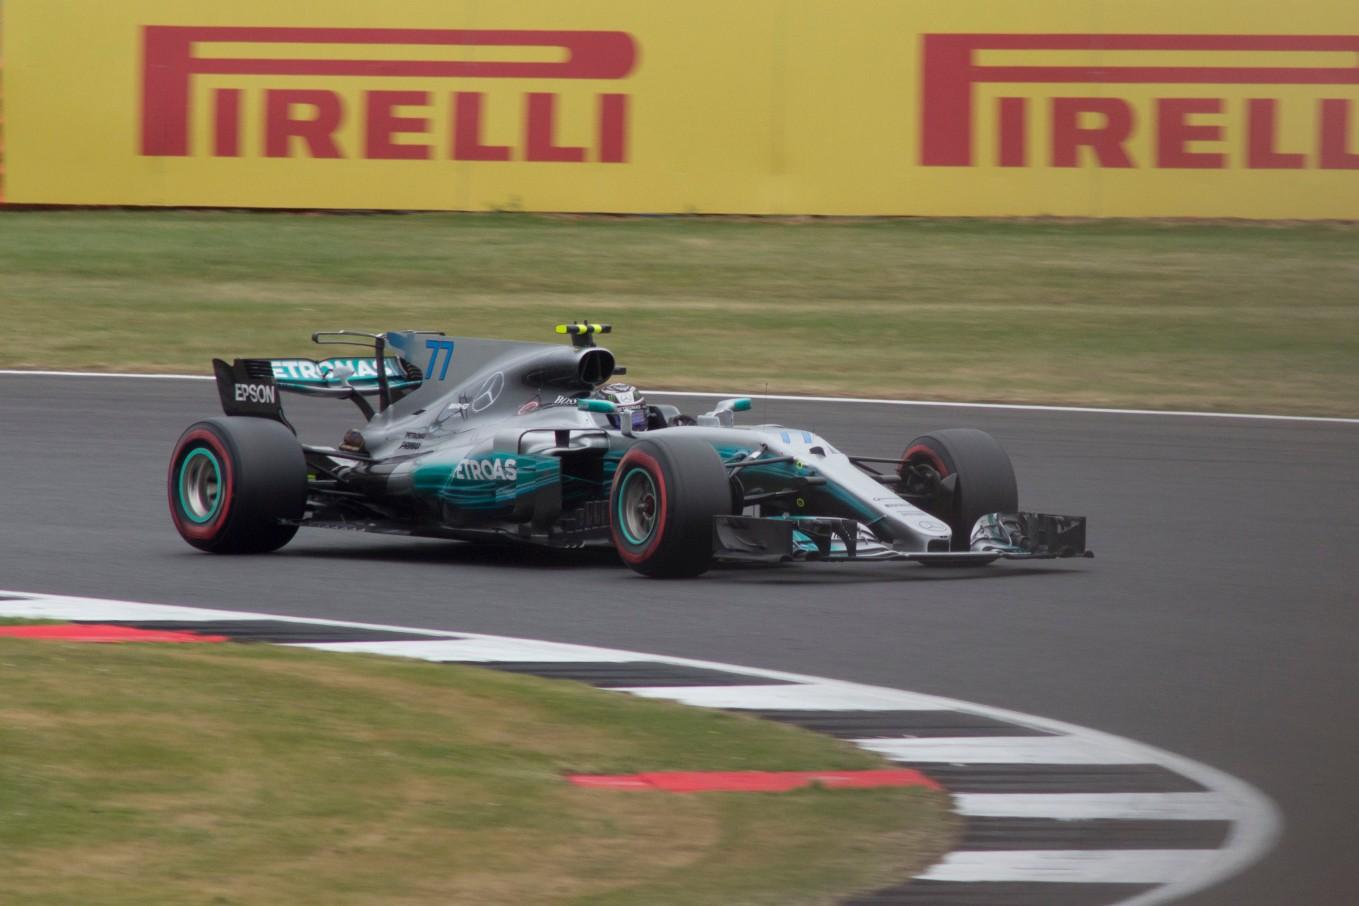 2nd: Valtteri Bottas, Mercedes